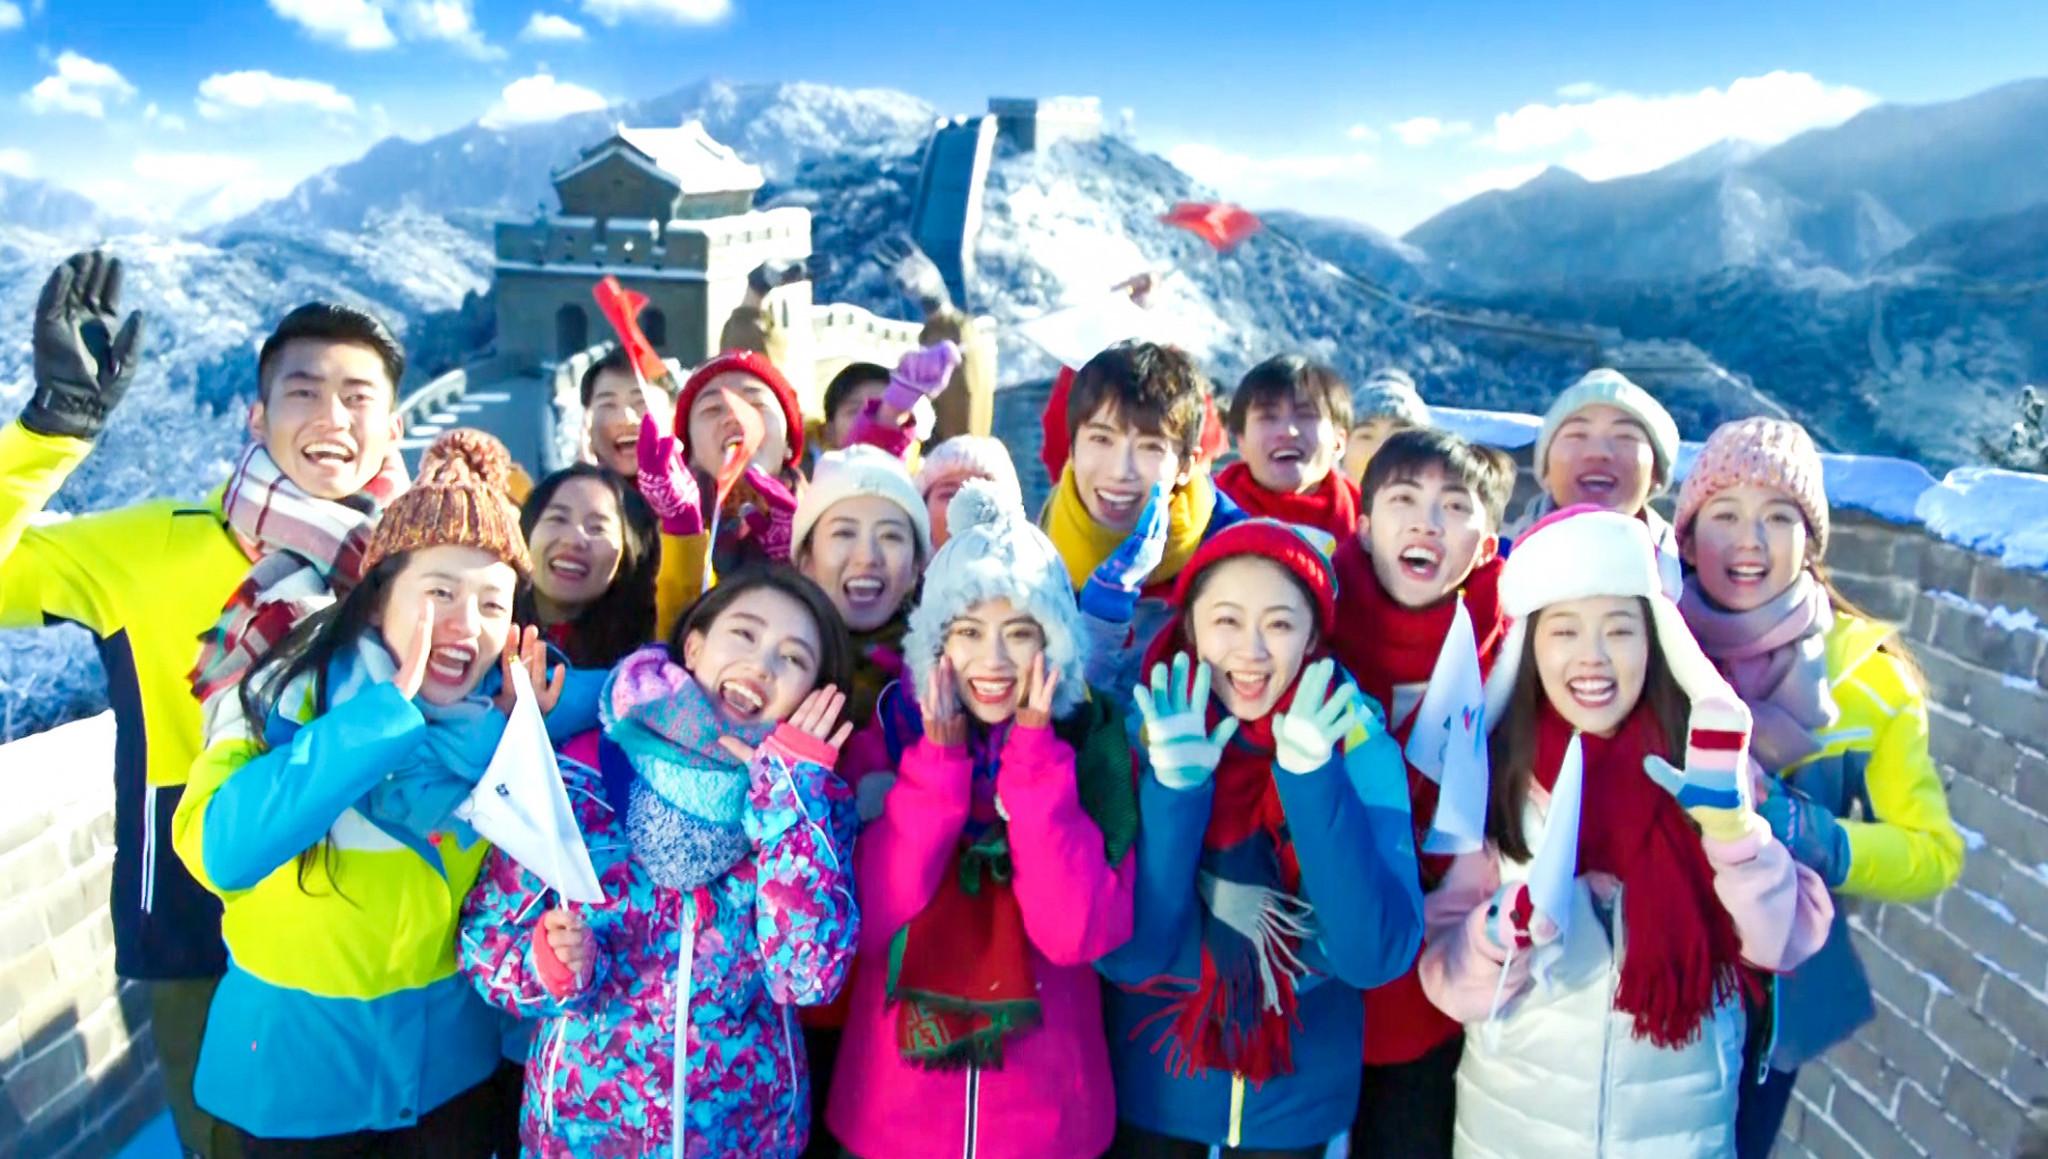 More than 610,000 people have applied to volunteer for Beijing 2022 ©Beijing 2022